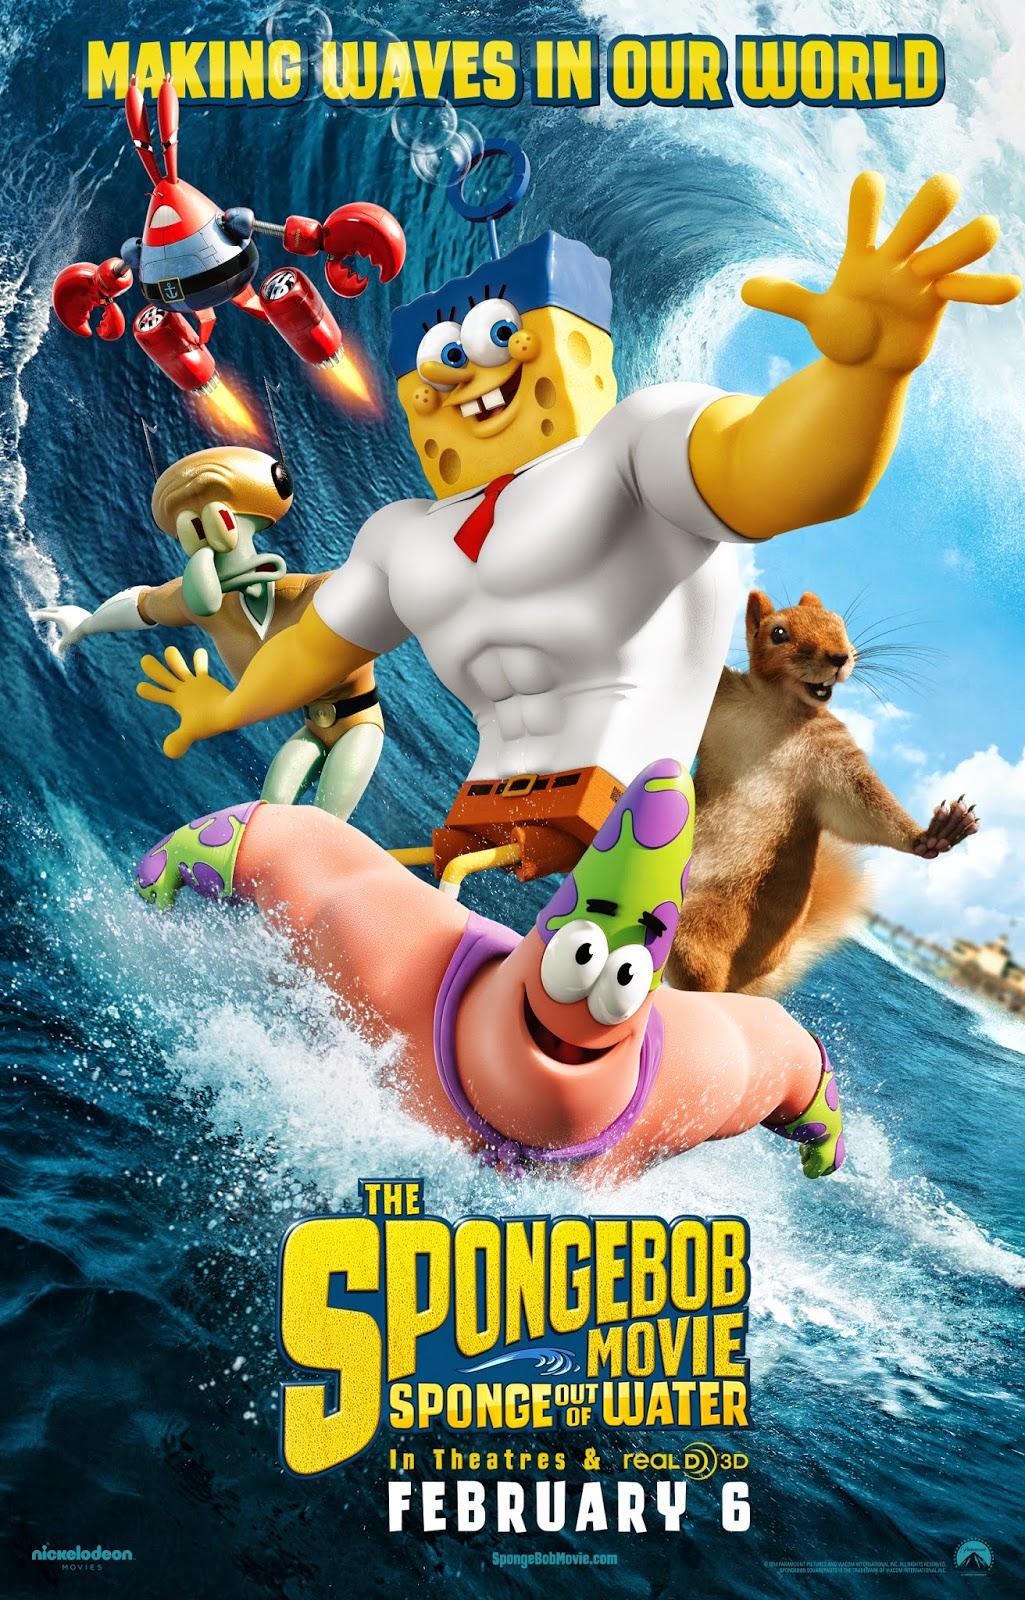 the spongebob movie sponge out of water wallpapers - The SpongeBob Movie Sponge Out of Water Official Movie